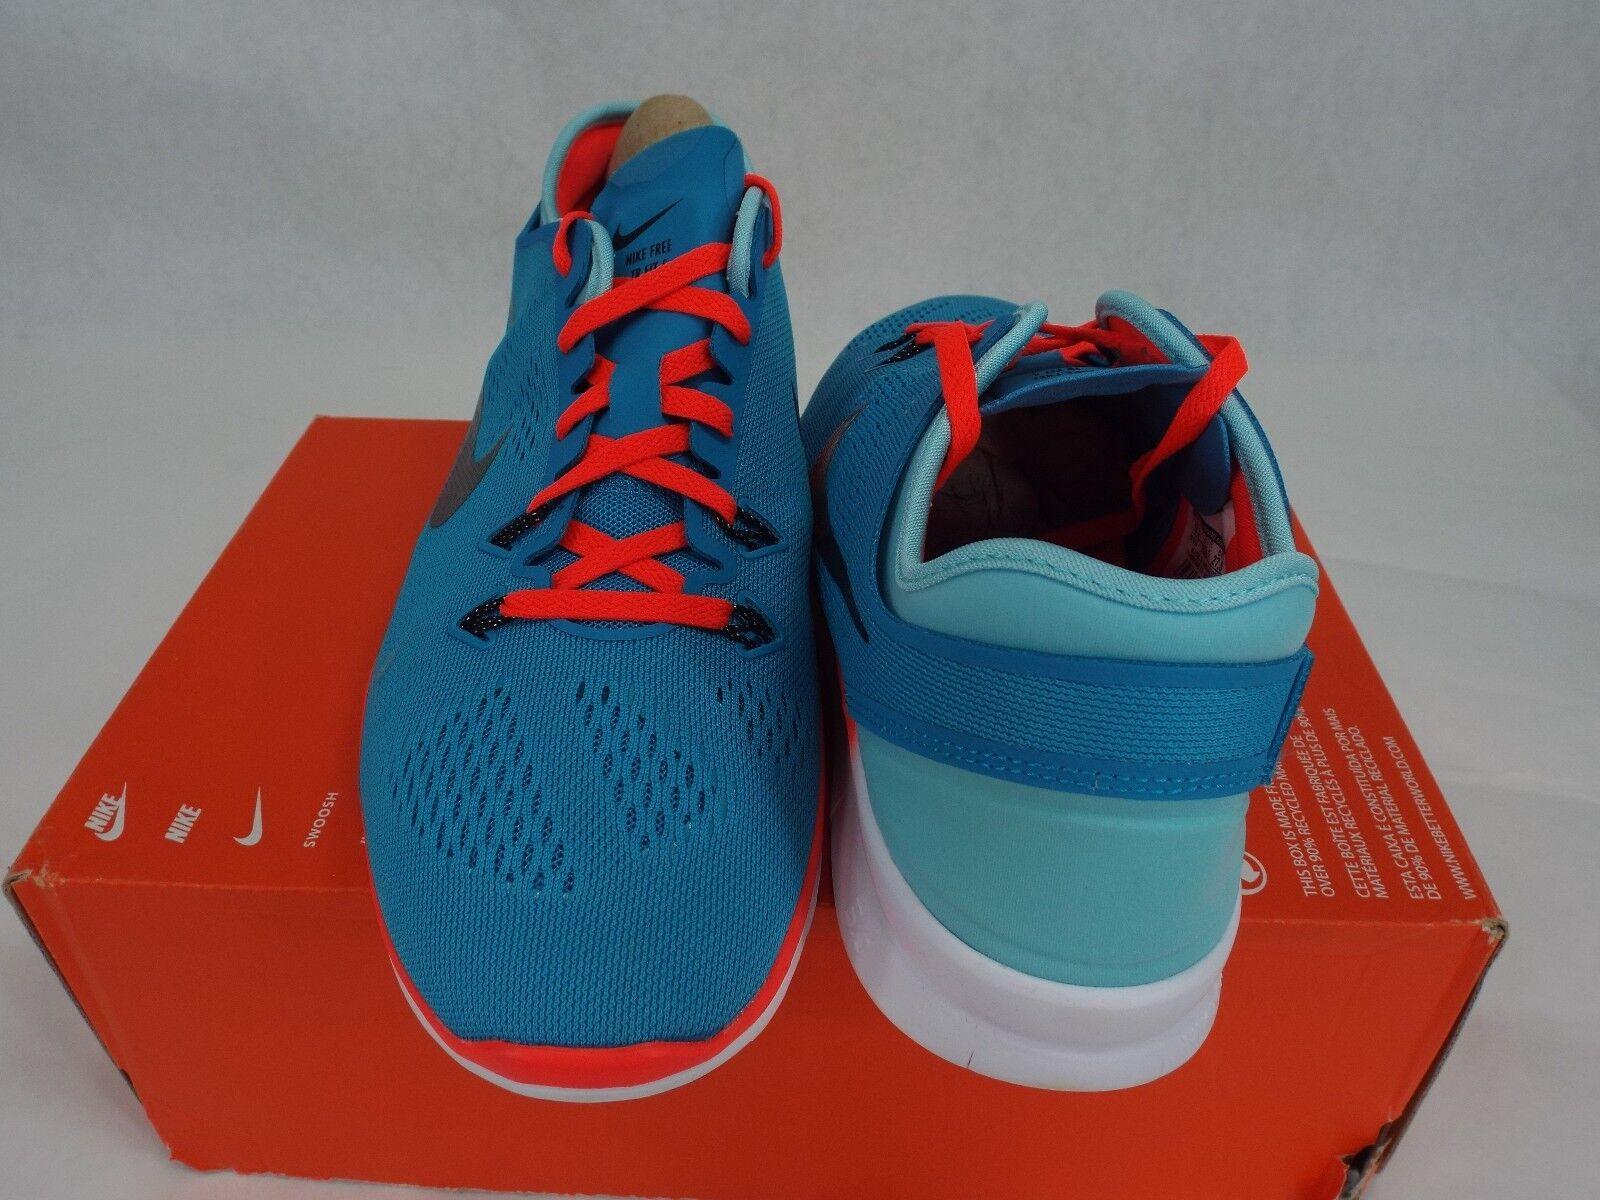 Nike mujer 684984 Zoom Fit Agilità Zapatos da Corsa 684984 mujer 701 Zapatos da Tennis af26f7